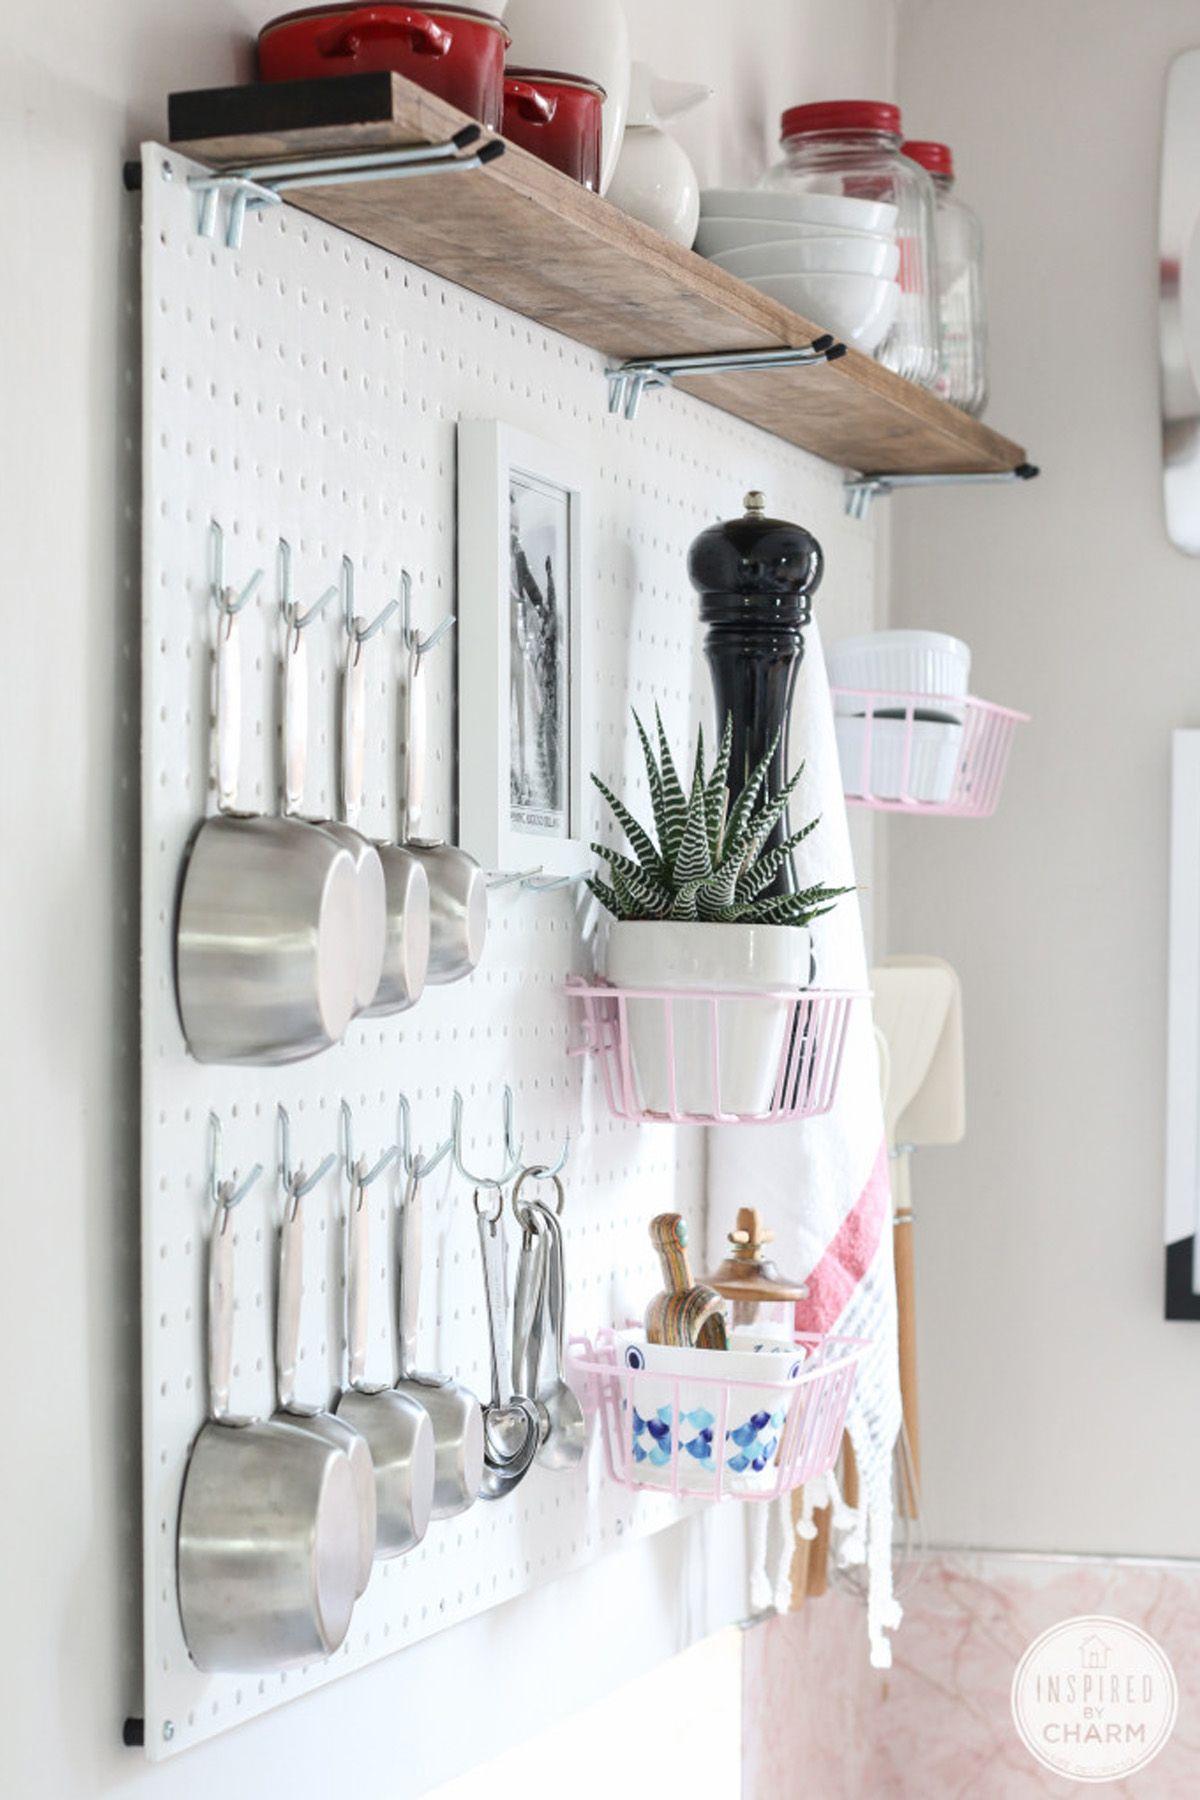 25 DIY Storage Ideas - Easy Home Storage Solutions